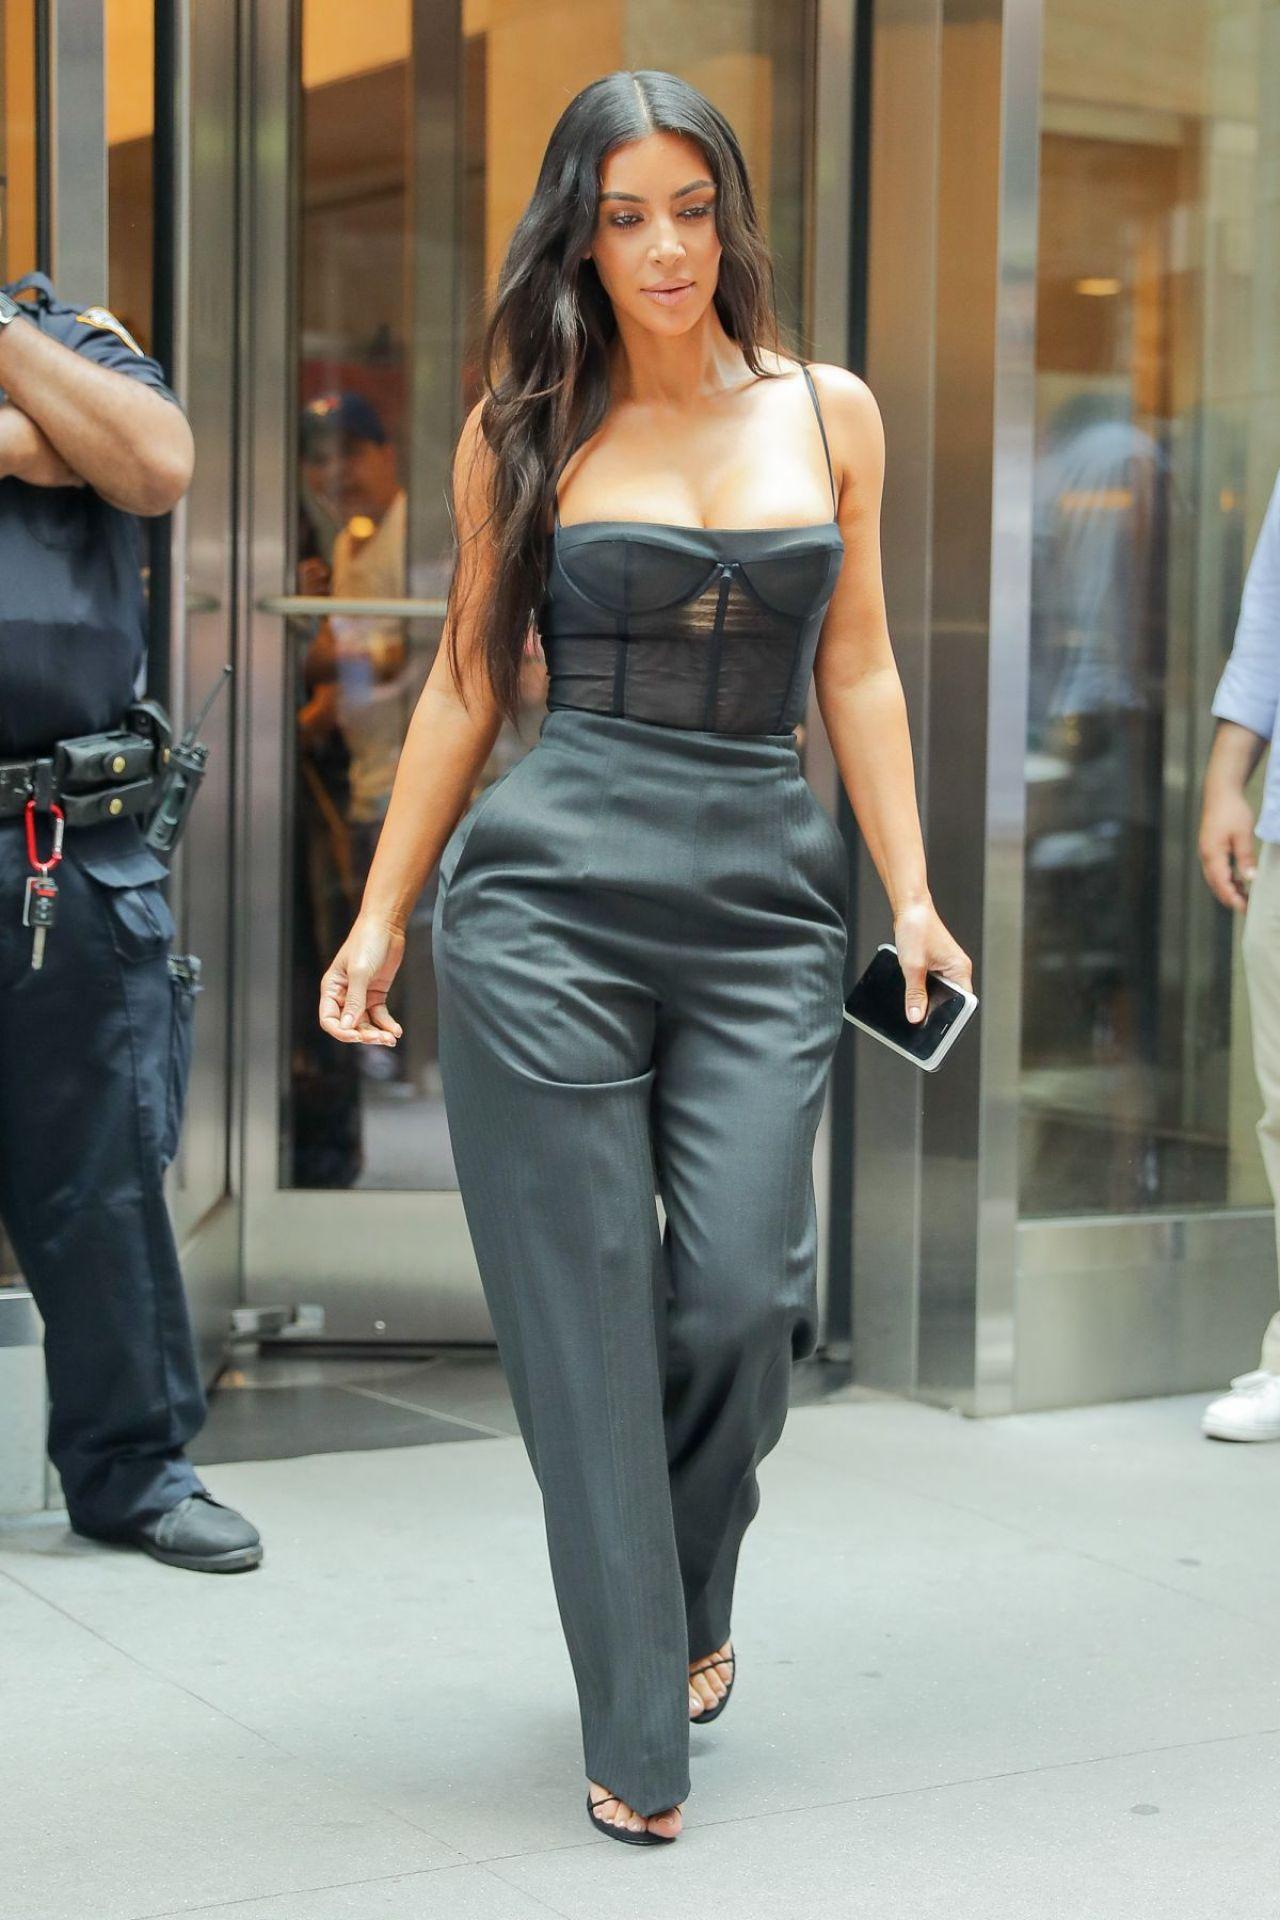 Kim Kardashian - Out in New York 06/14/2017 Kim Kardashian